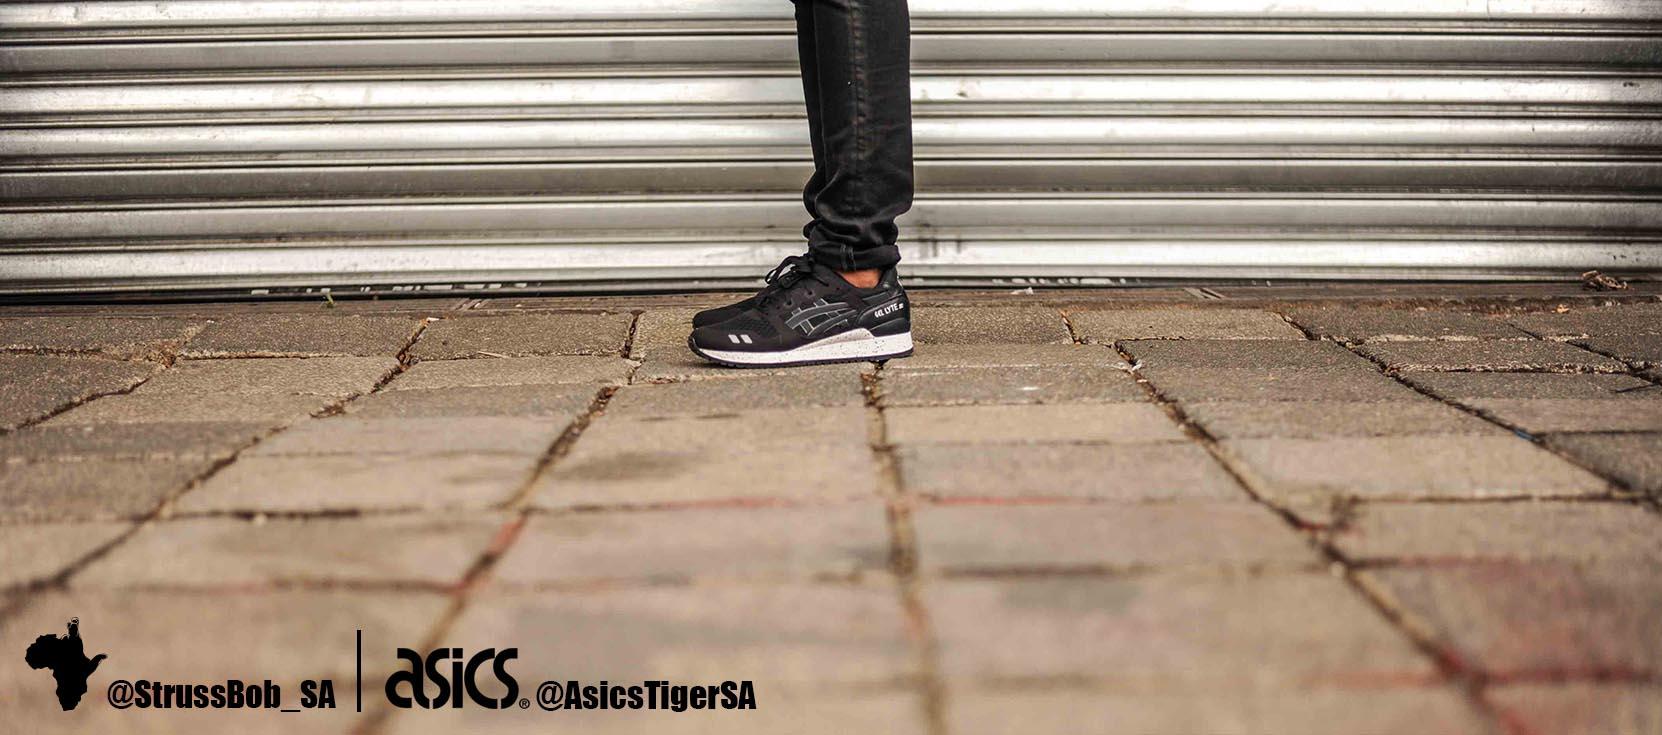 asics x strussbob shoot 6  black